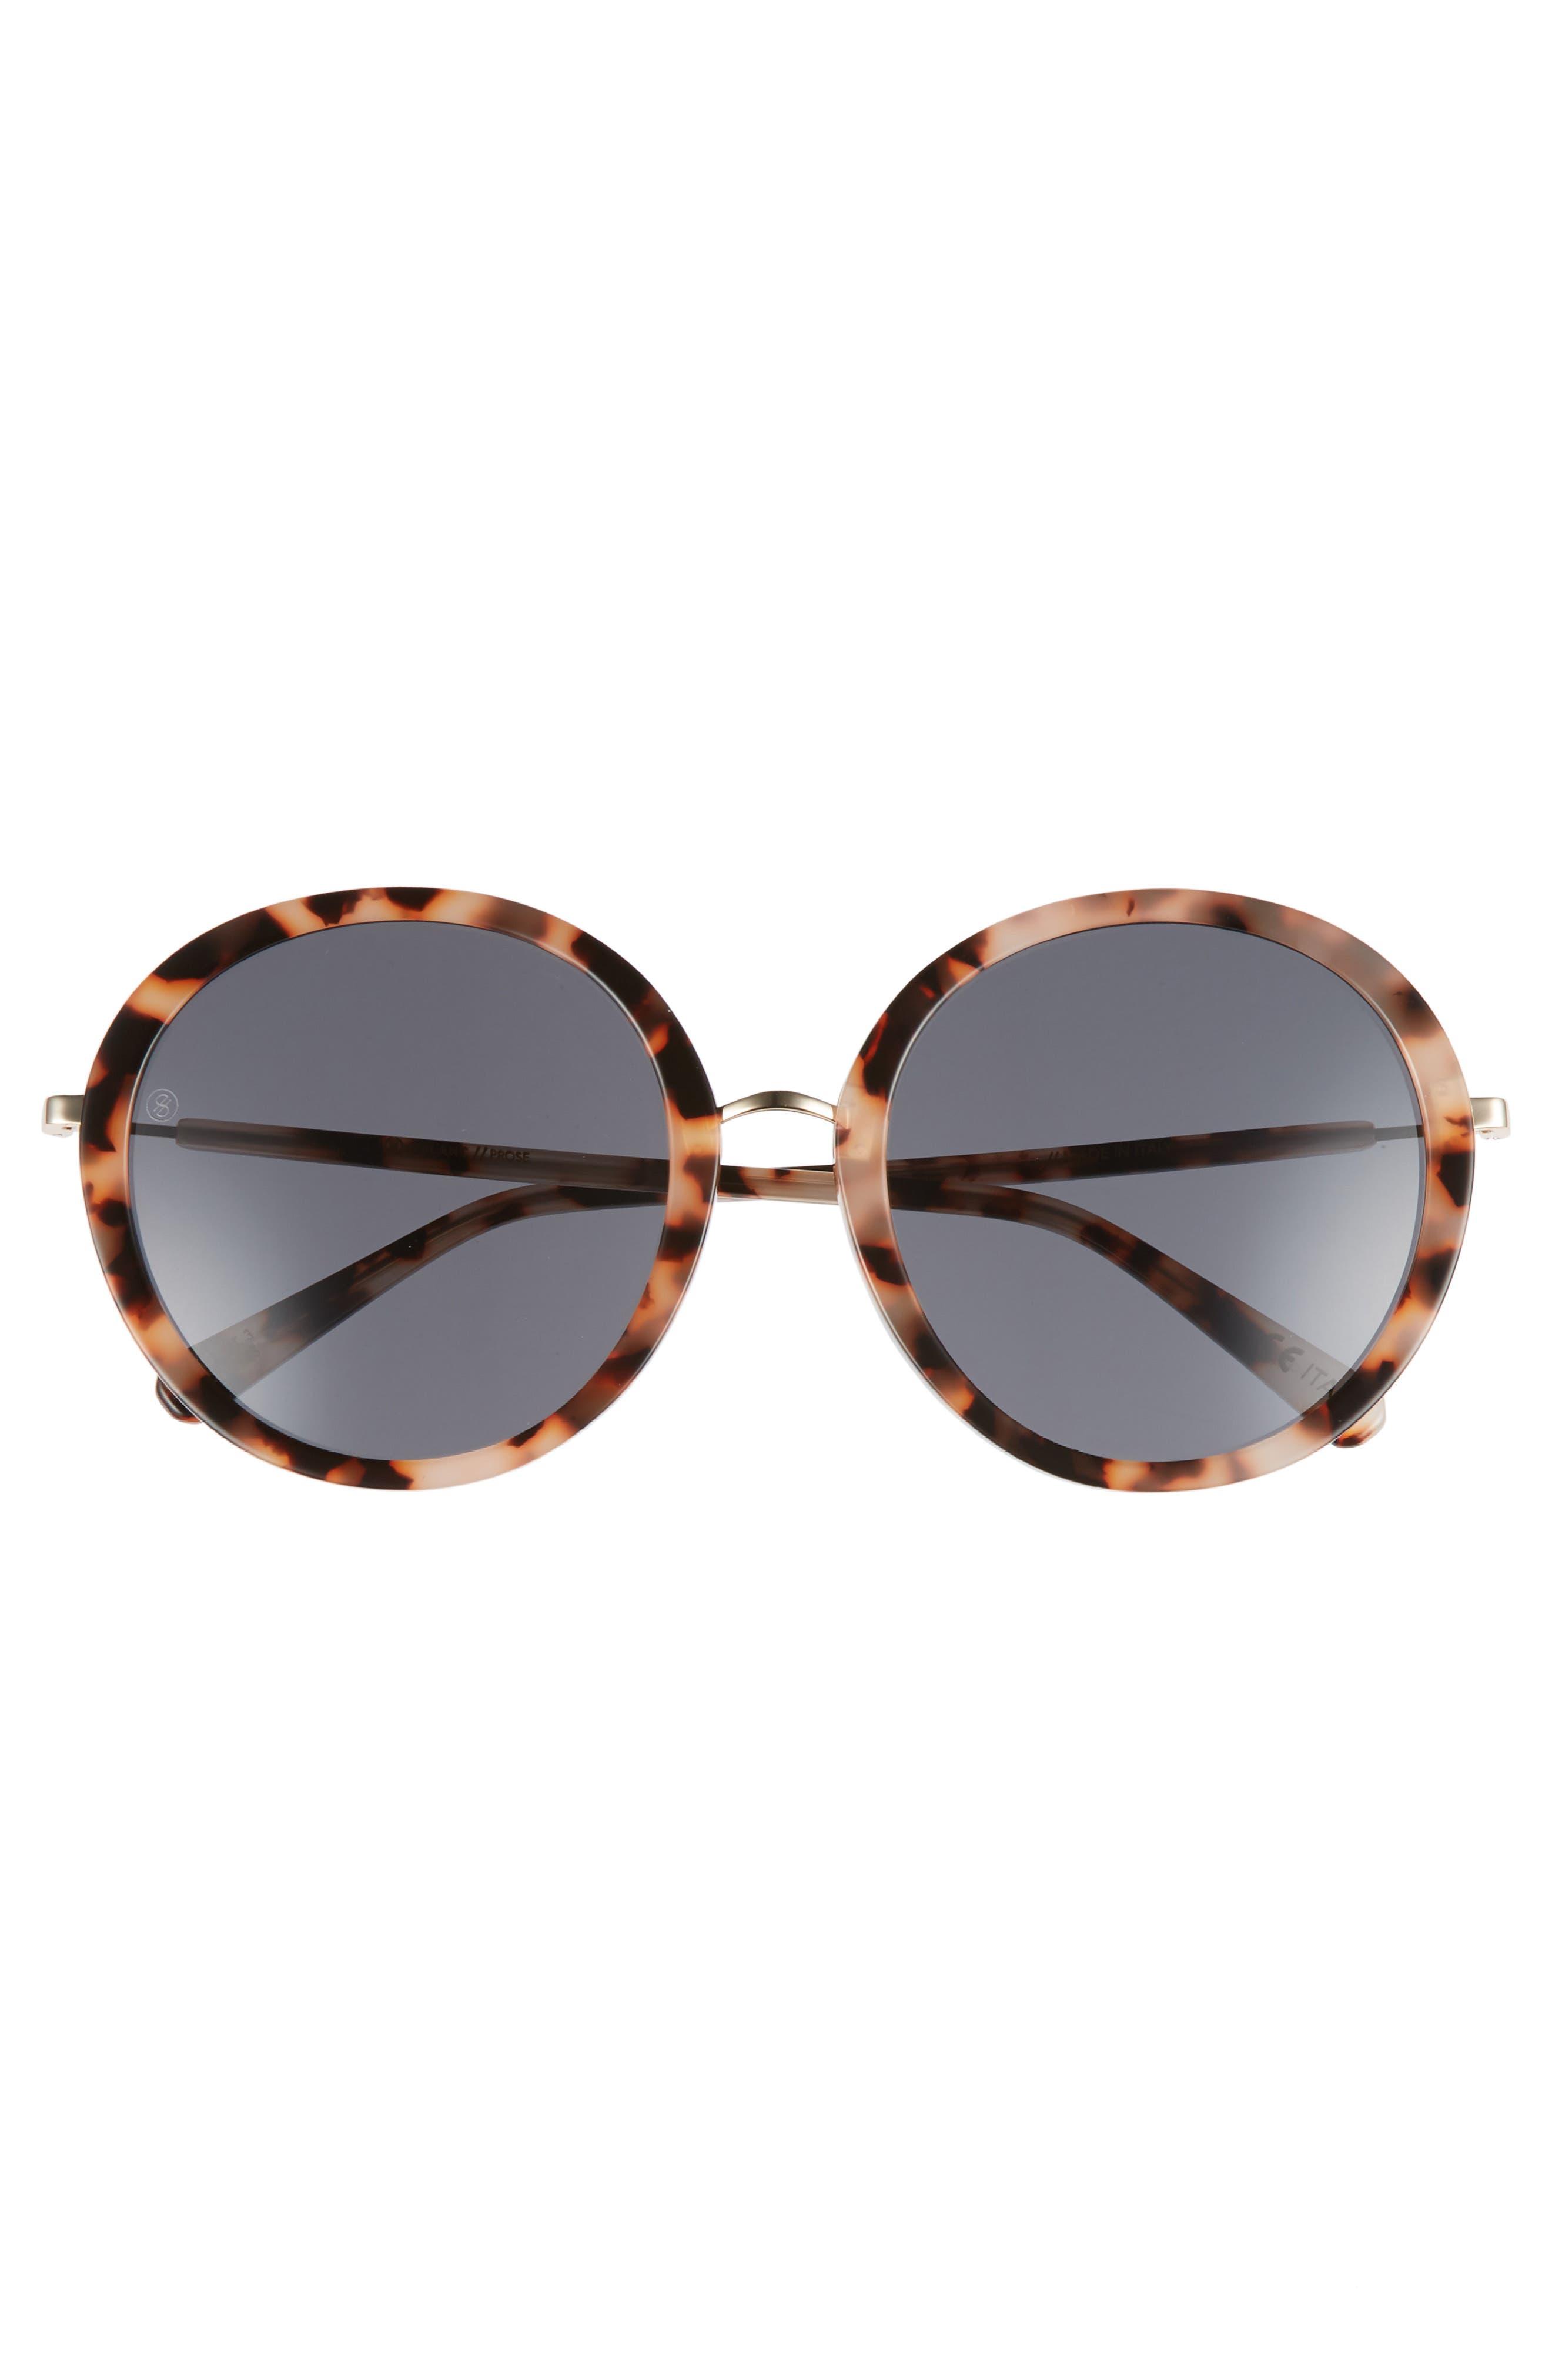 D'BLANC Prose 56mm Round Sunglasses,                             Alternate thumbnail 3, color,                             200